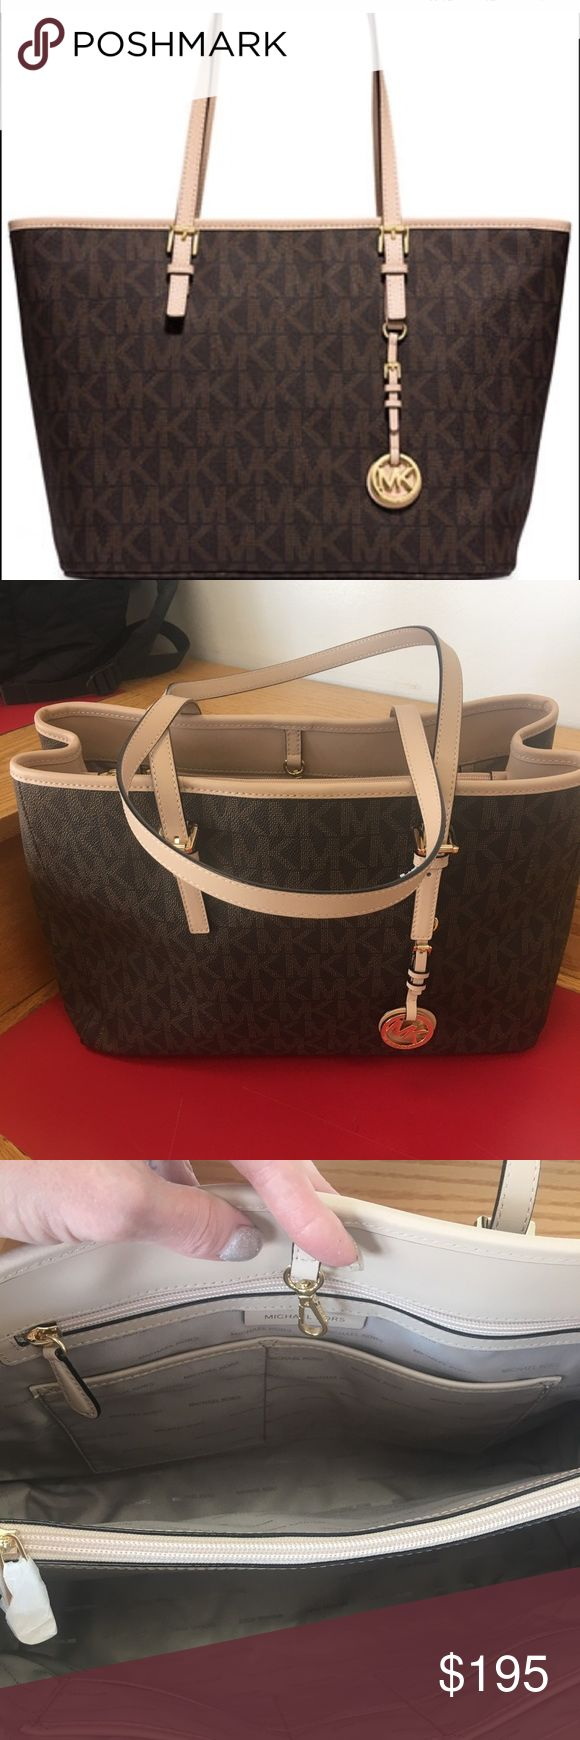 NWT Michael Kors Jet Set Travel Bag 💼 Brand new. Michael Kors Bags Travel Bags